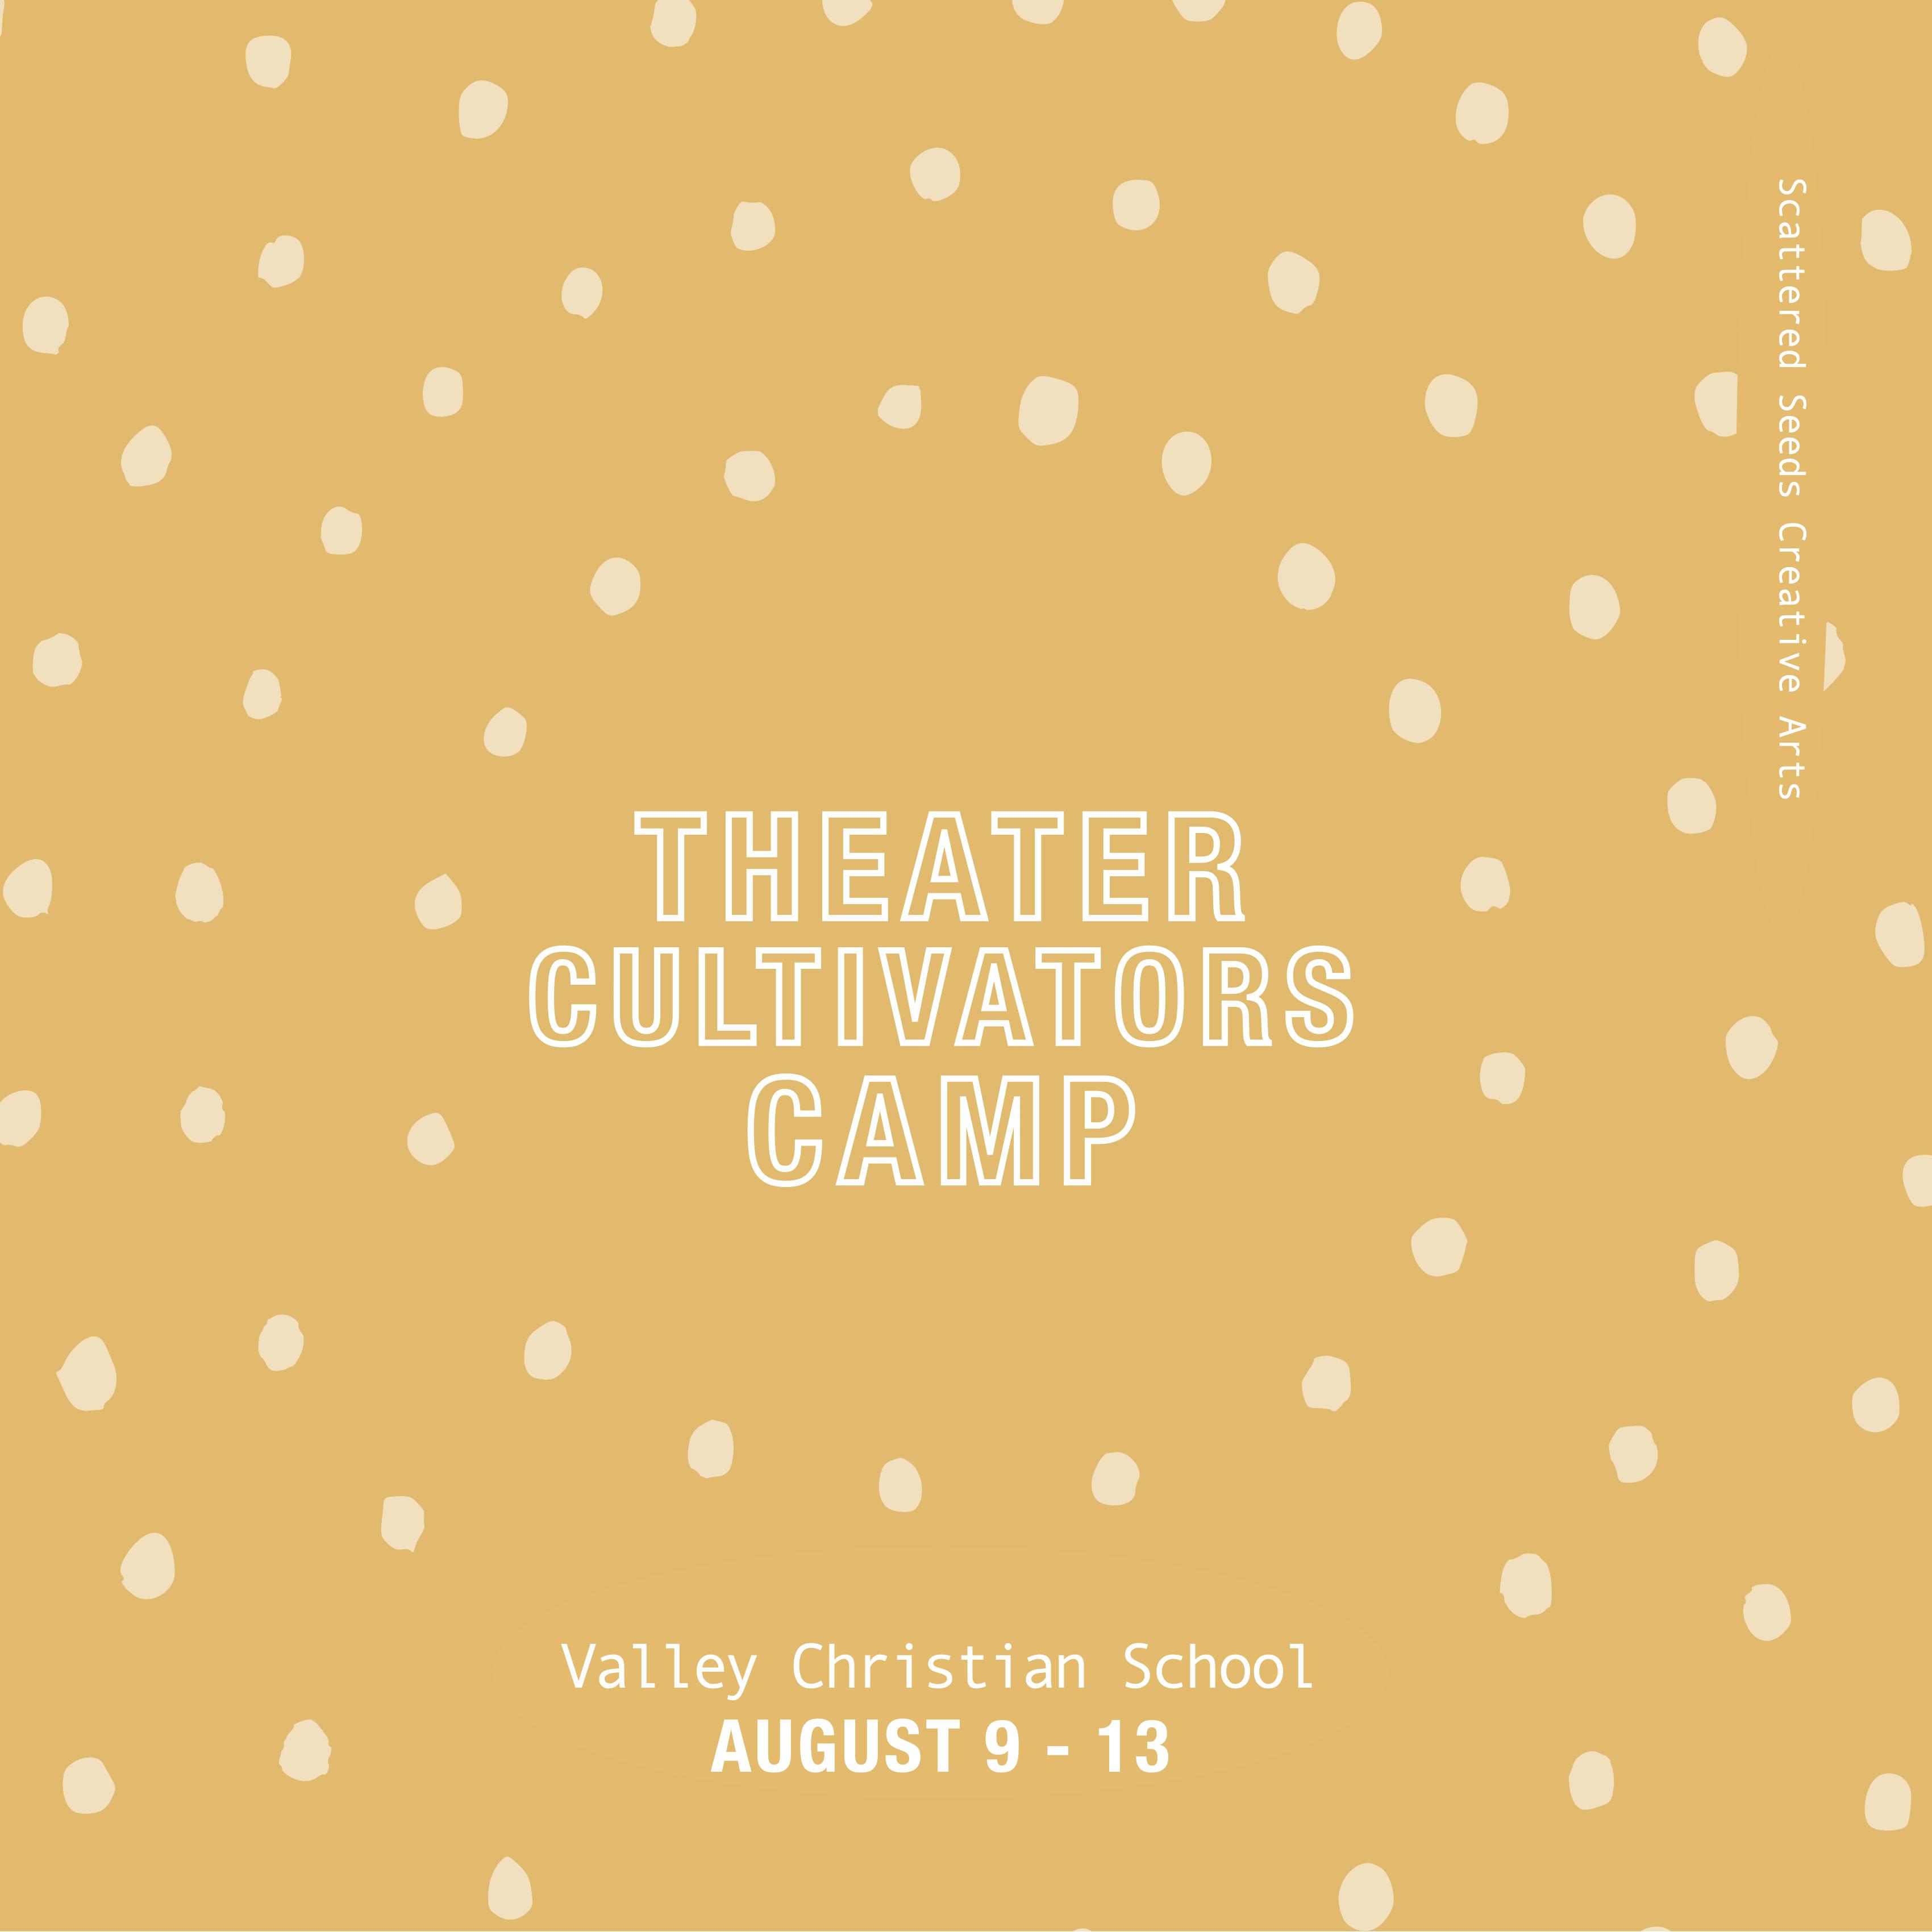 Theater Cultivators Camp (August 9-13, 9 a.m. – 3 p.m.):